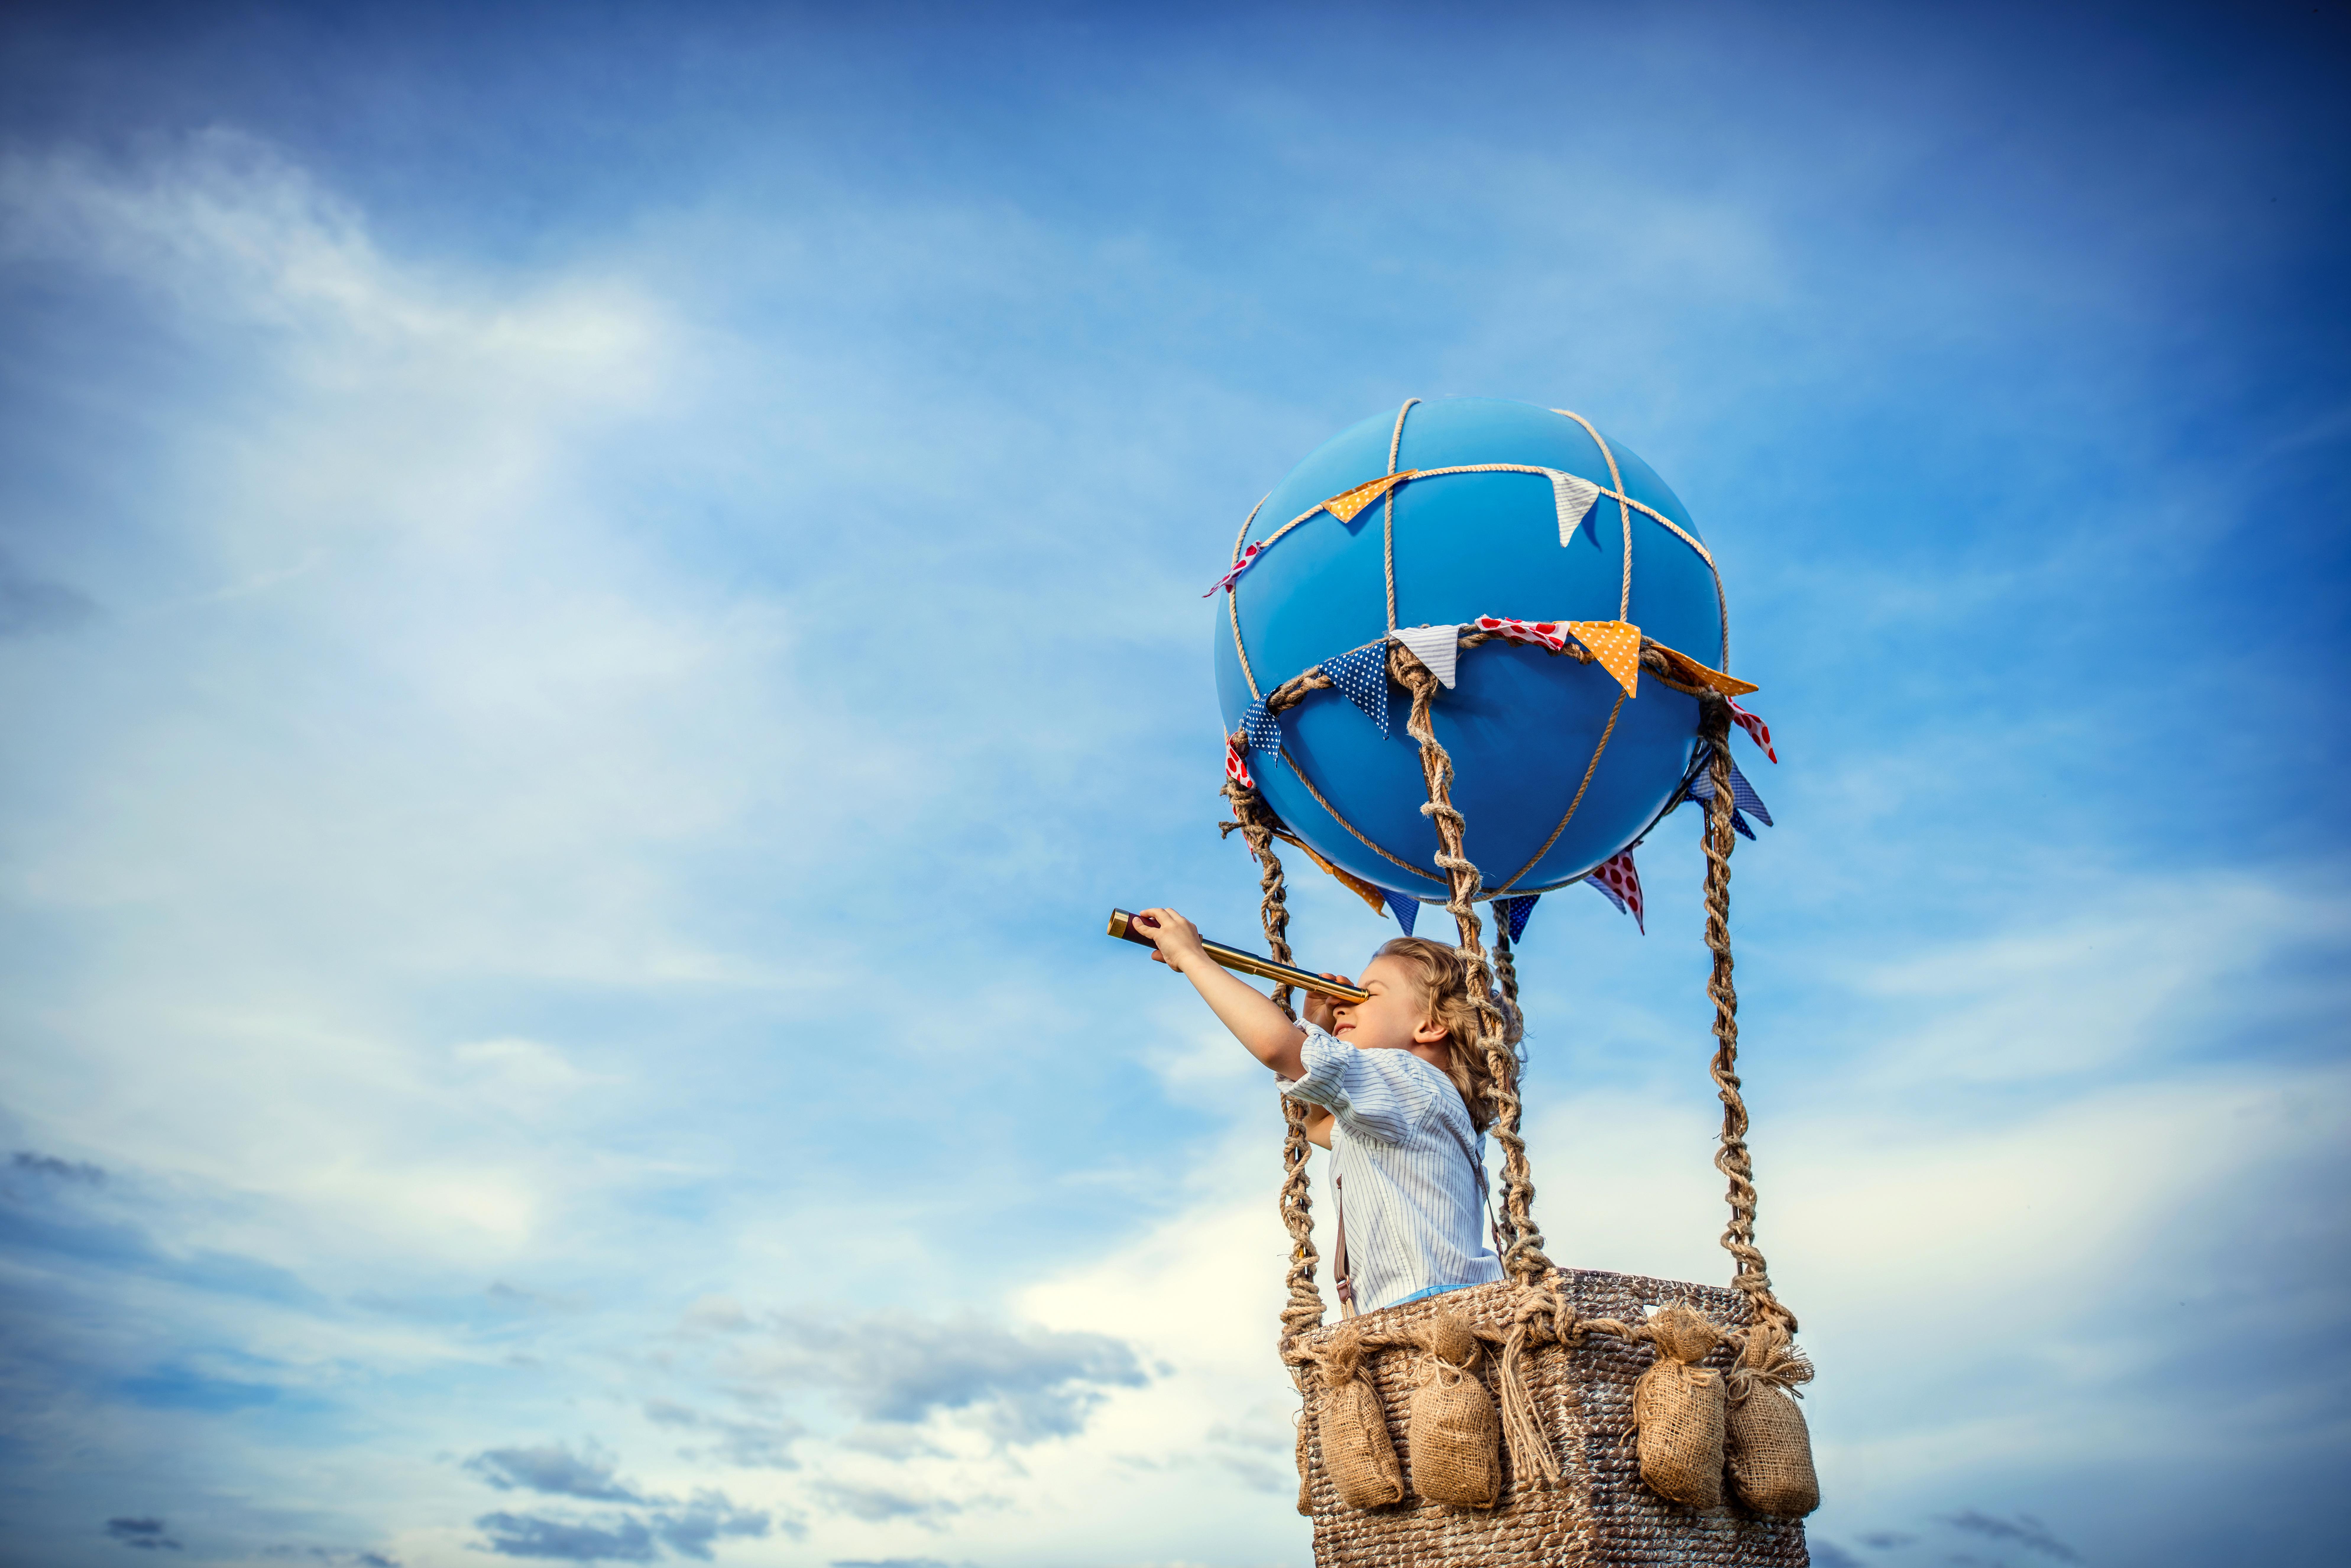 Little boy in a balloon outdoors